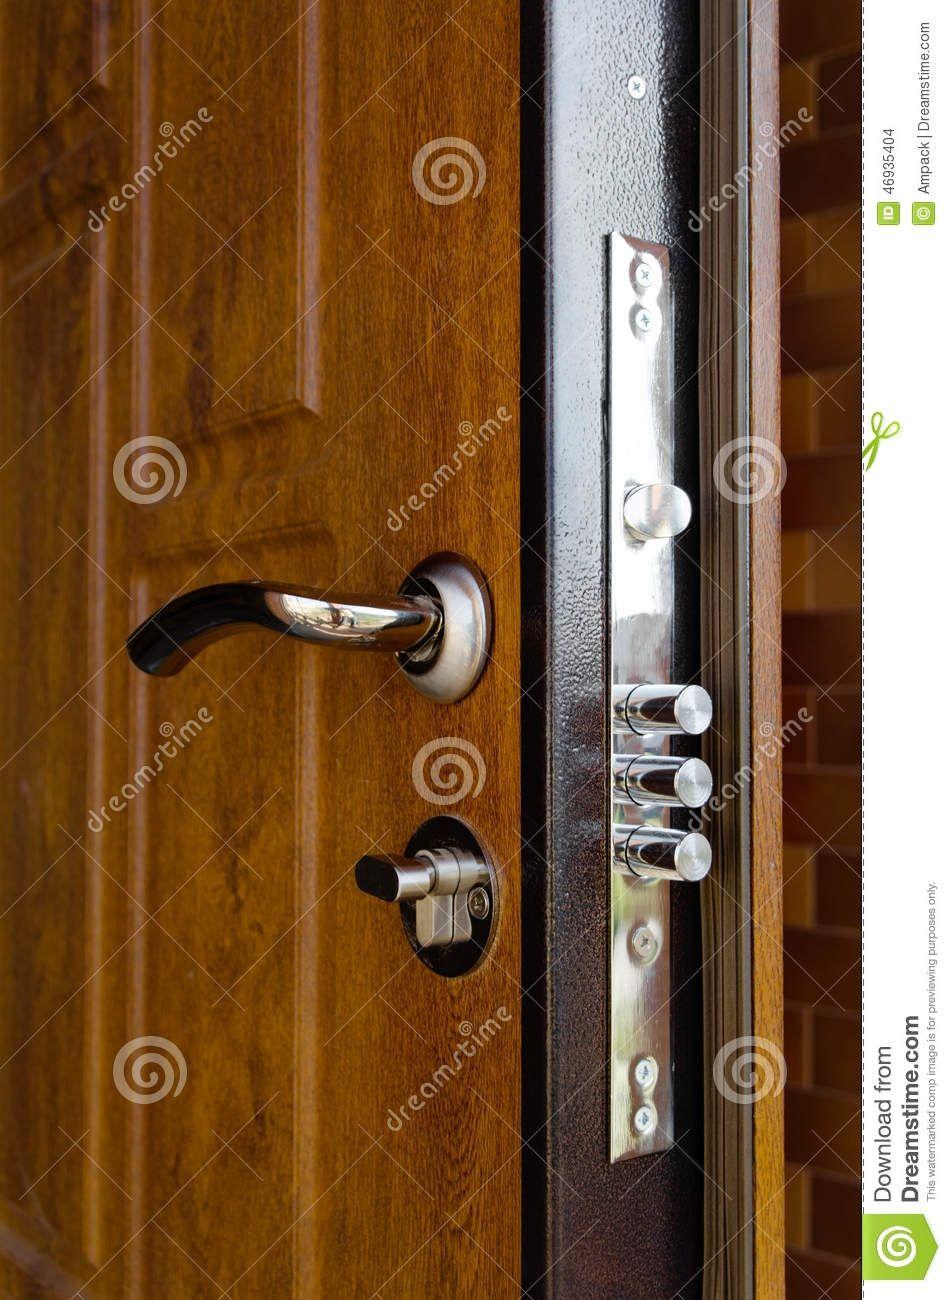 High Security Lock Front Door | http://franzdondi.com | Pinterest ...